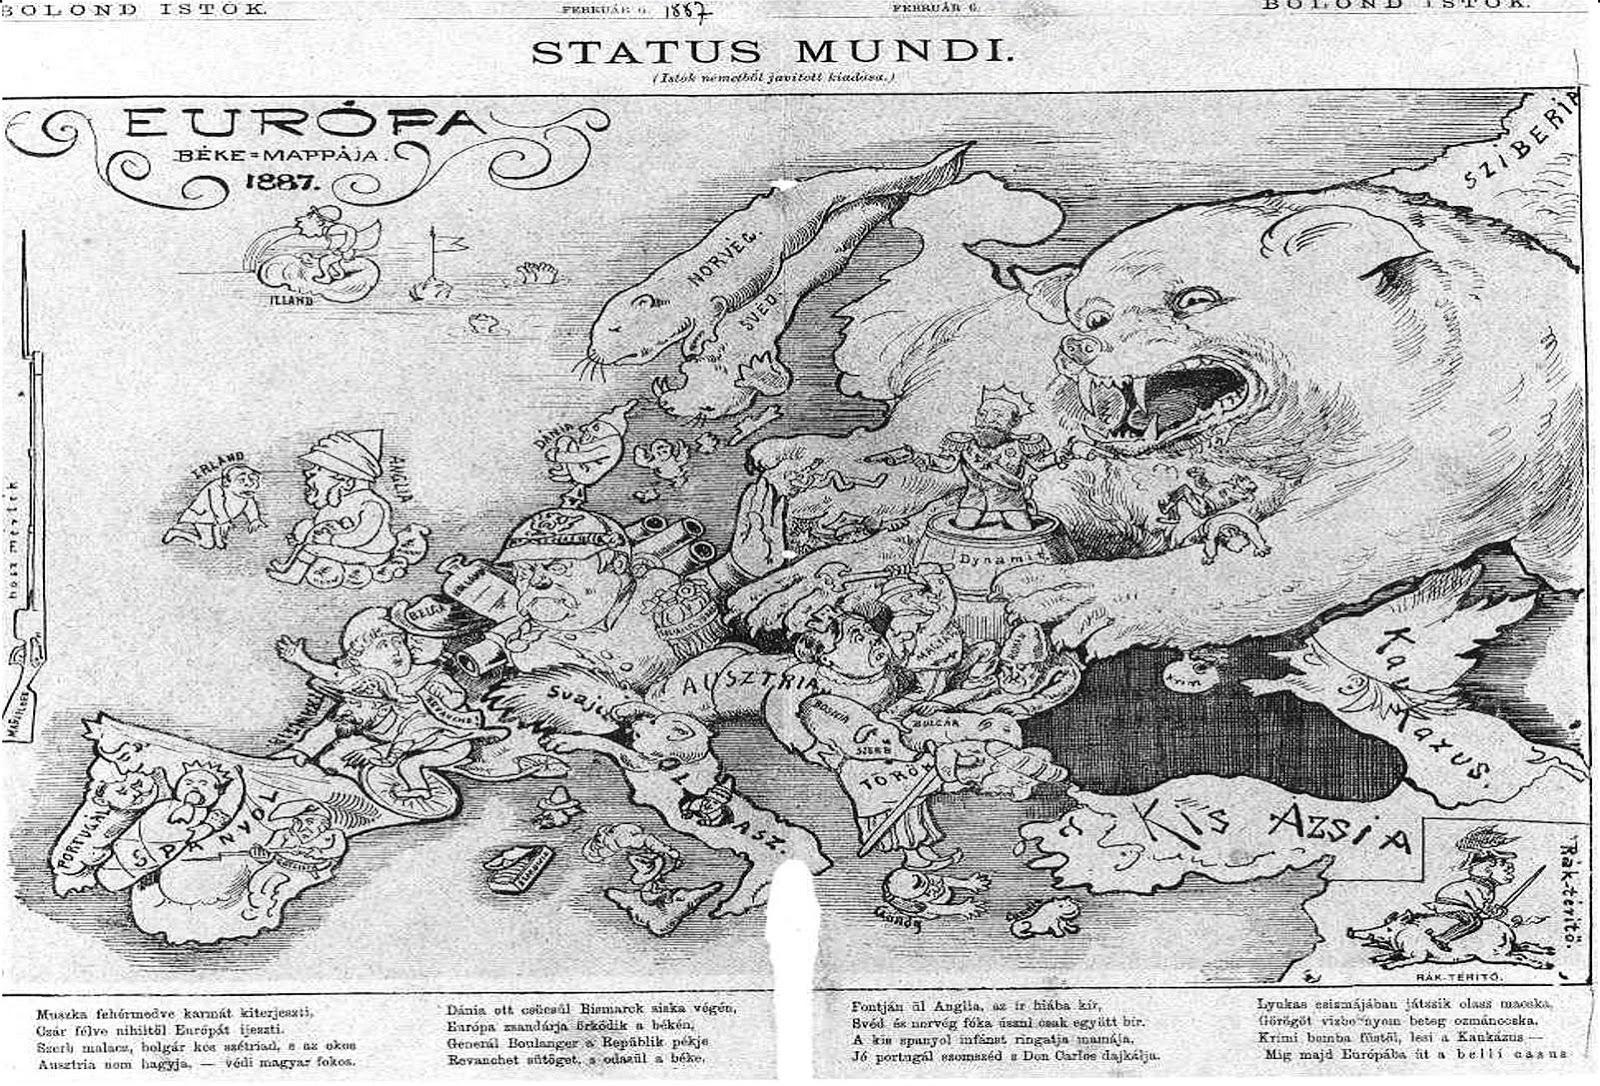 Status mundi / Európa béke-mappája (1887) (Hungarian)